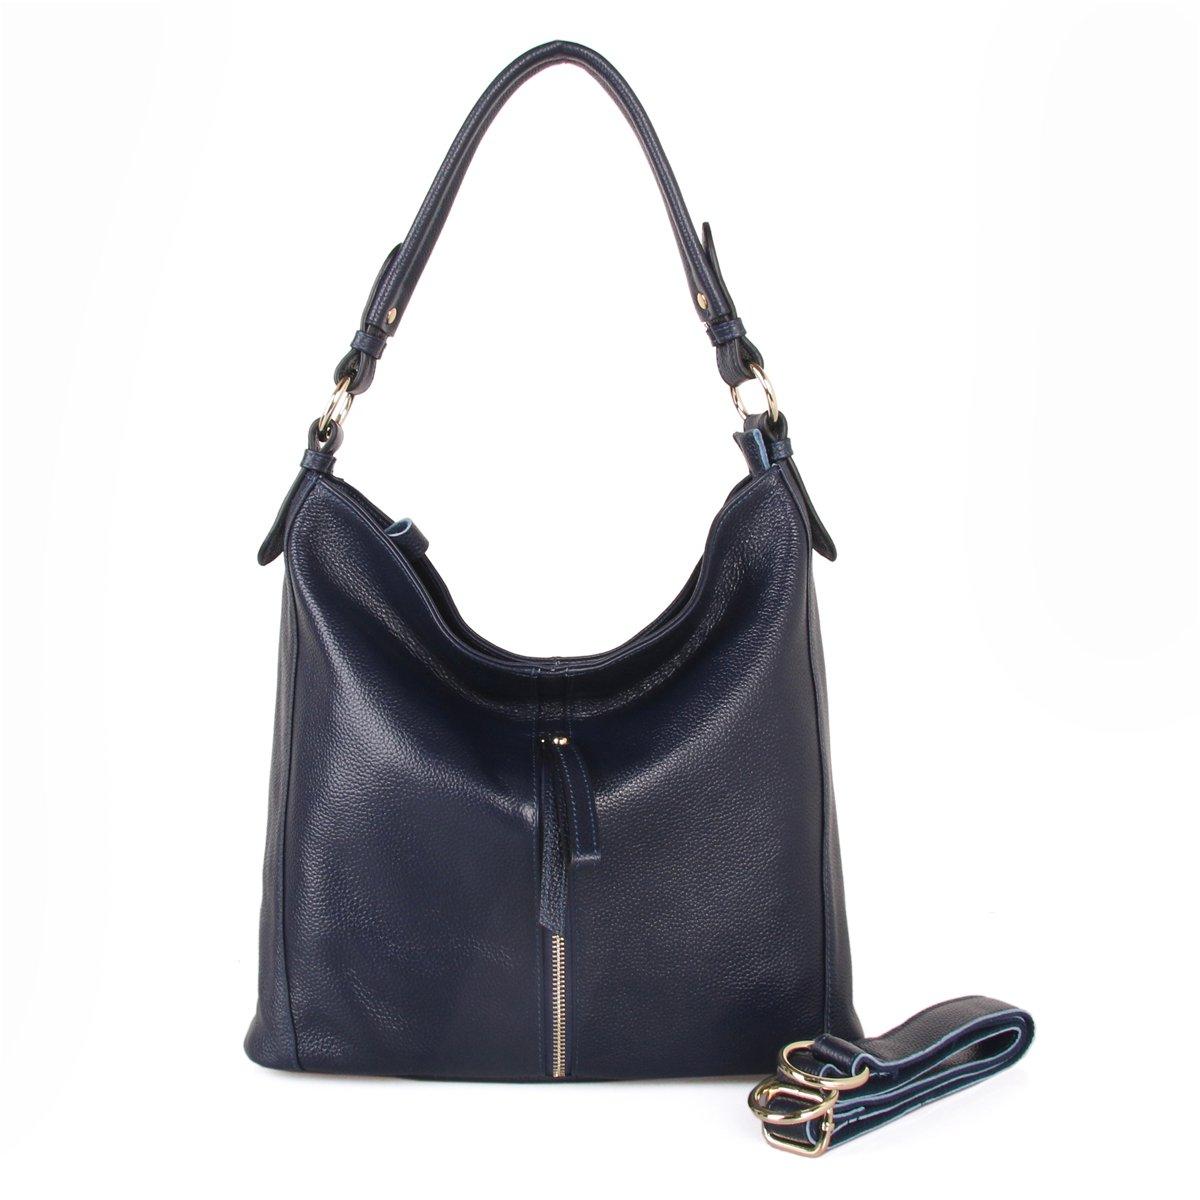 CDM product Giustino Womens Genuine Leather Handbag Shoulder Bag Top-Handle Handbags, Blue big image